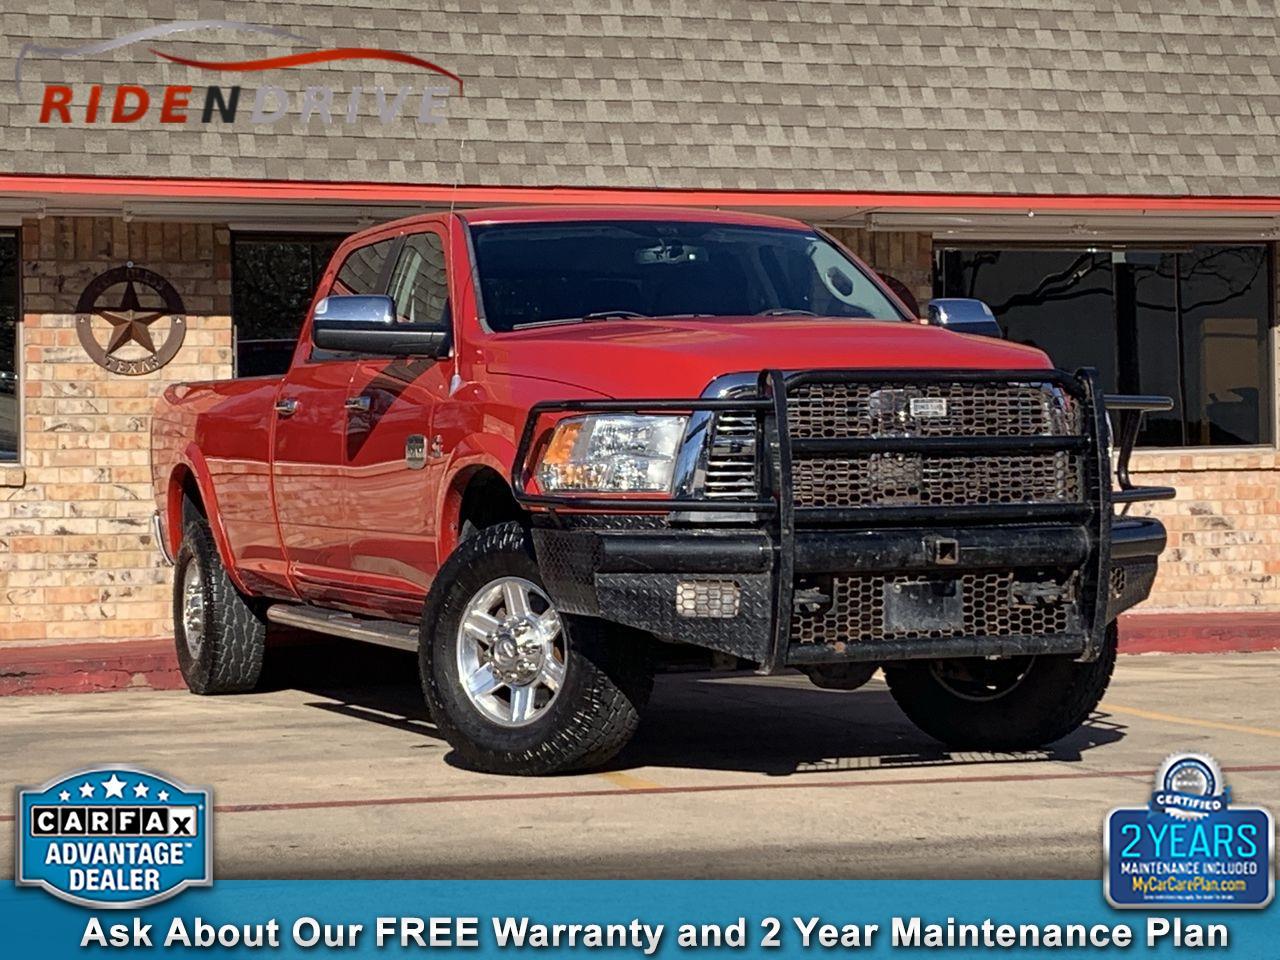 "2012 RAM 2500 4WD Crew Cab 169"" Laramie Longhorn"